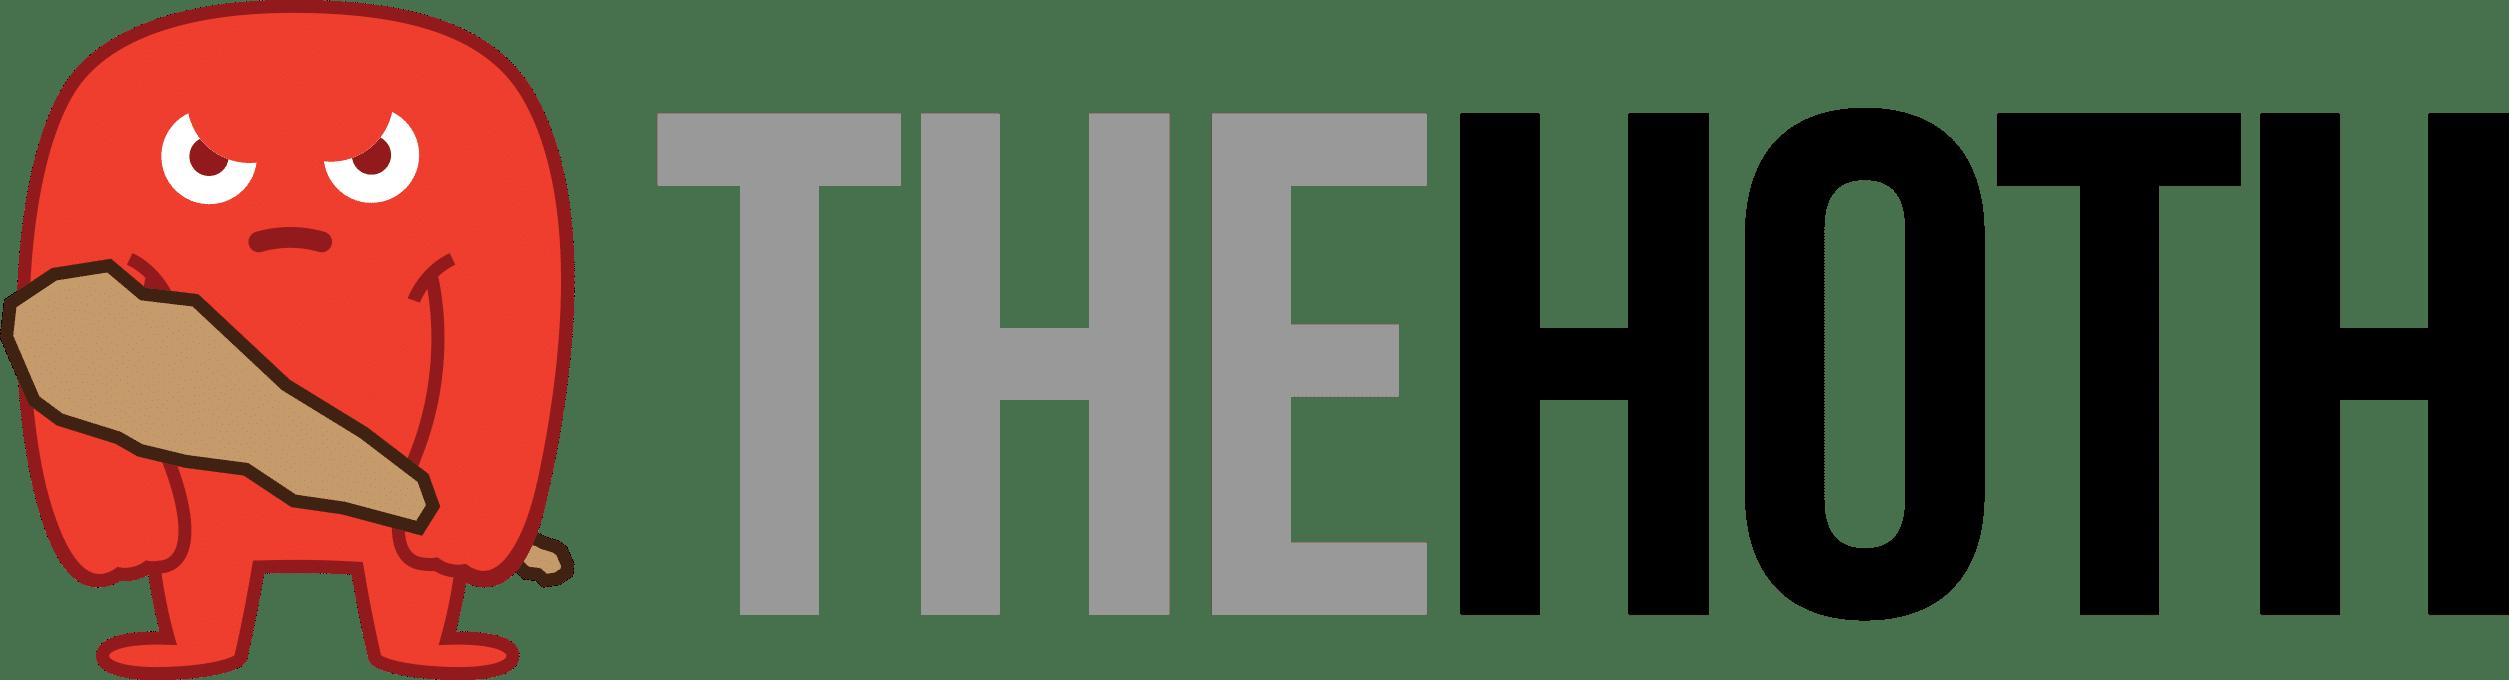 hoth_logo